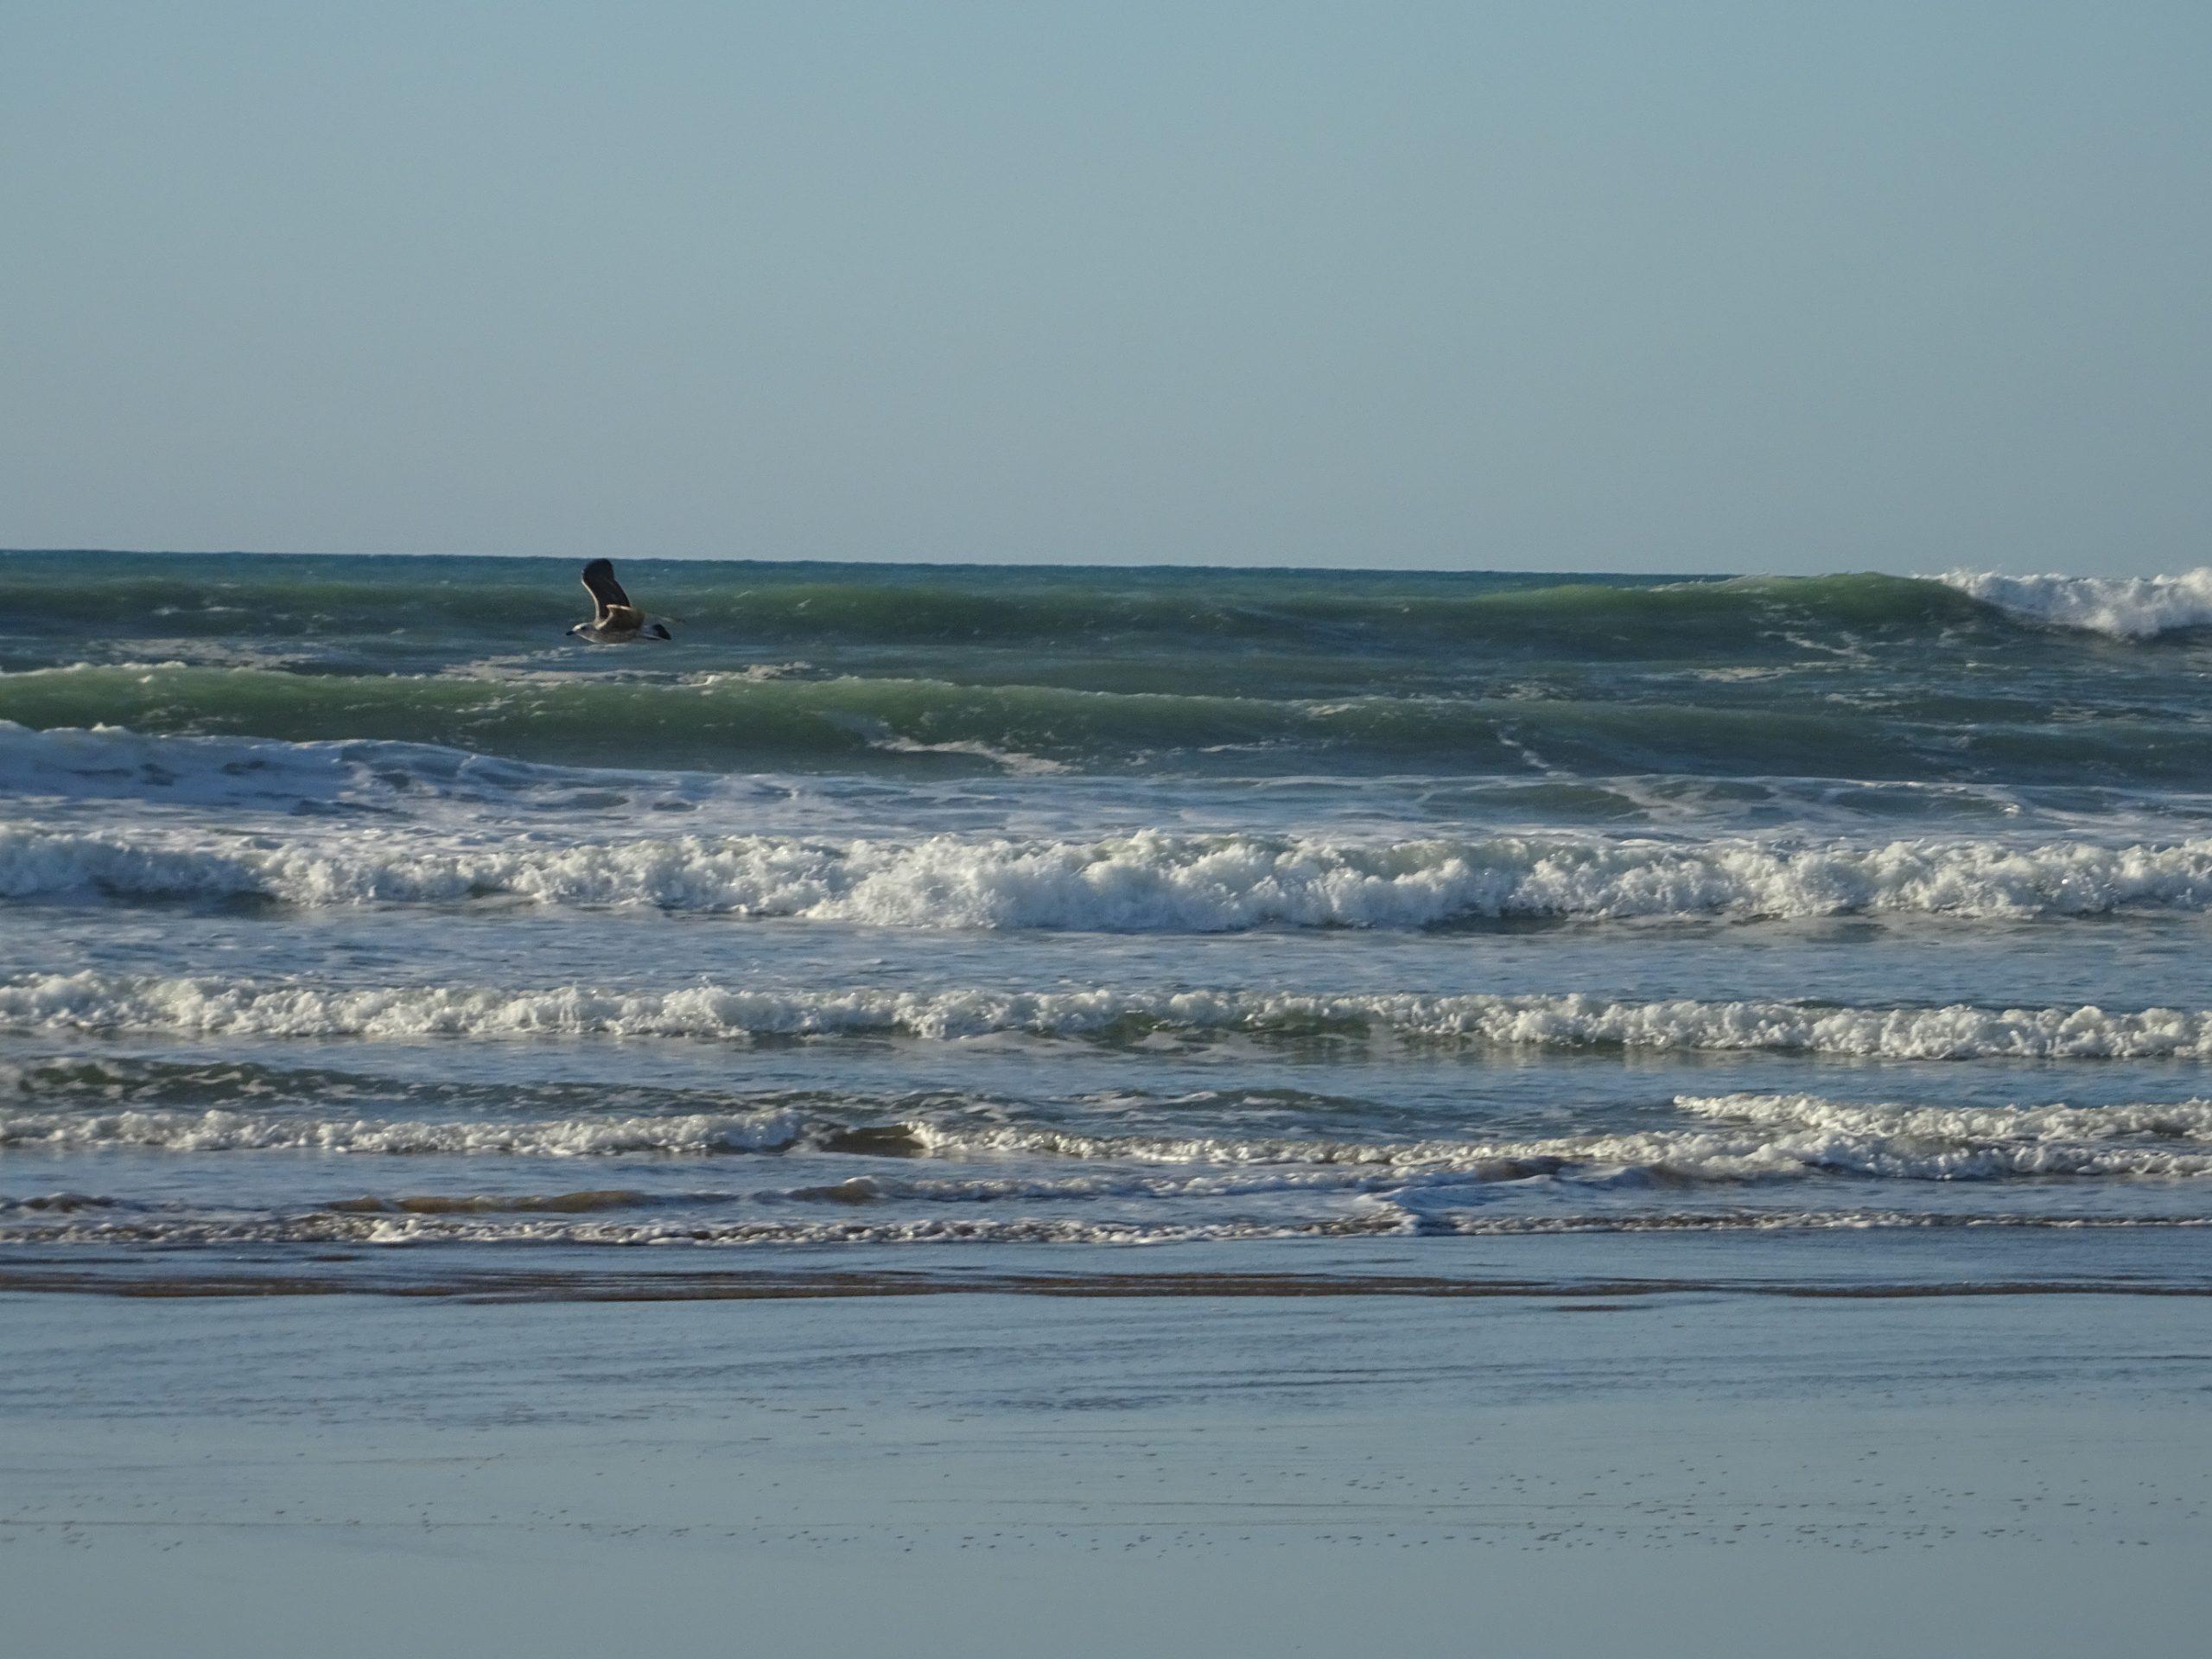 sea waves and one bird